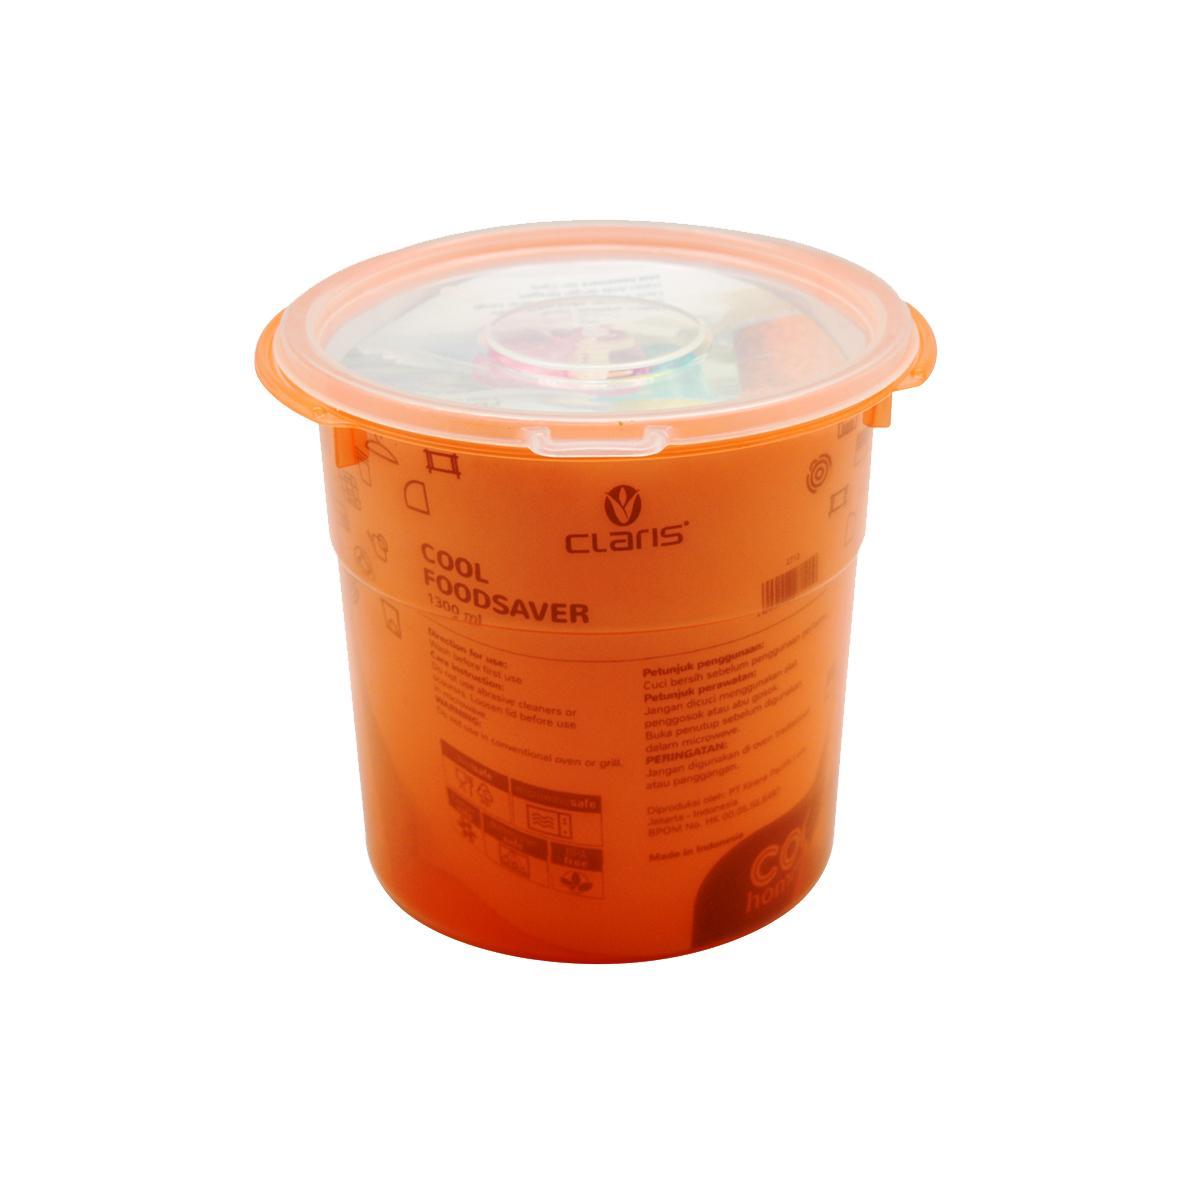 Features Claris Toples Kue Kering 1300 Ml Plastik Sambal Snack Peralatan Dapur